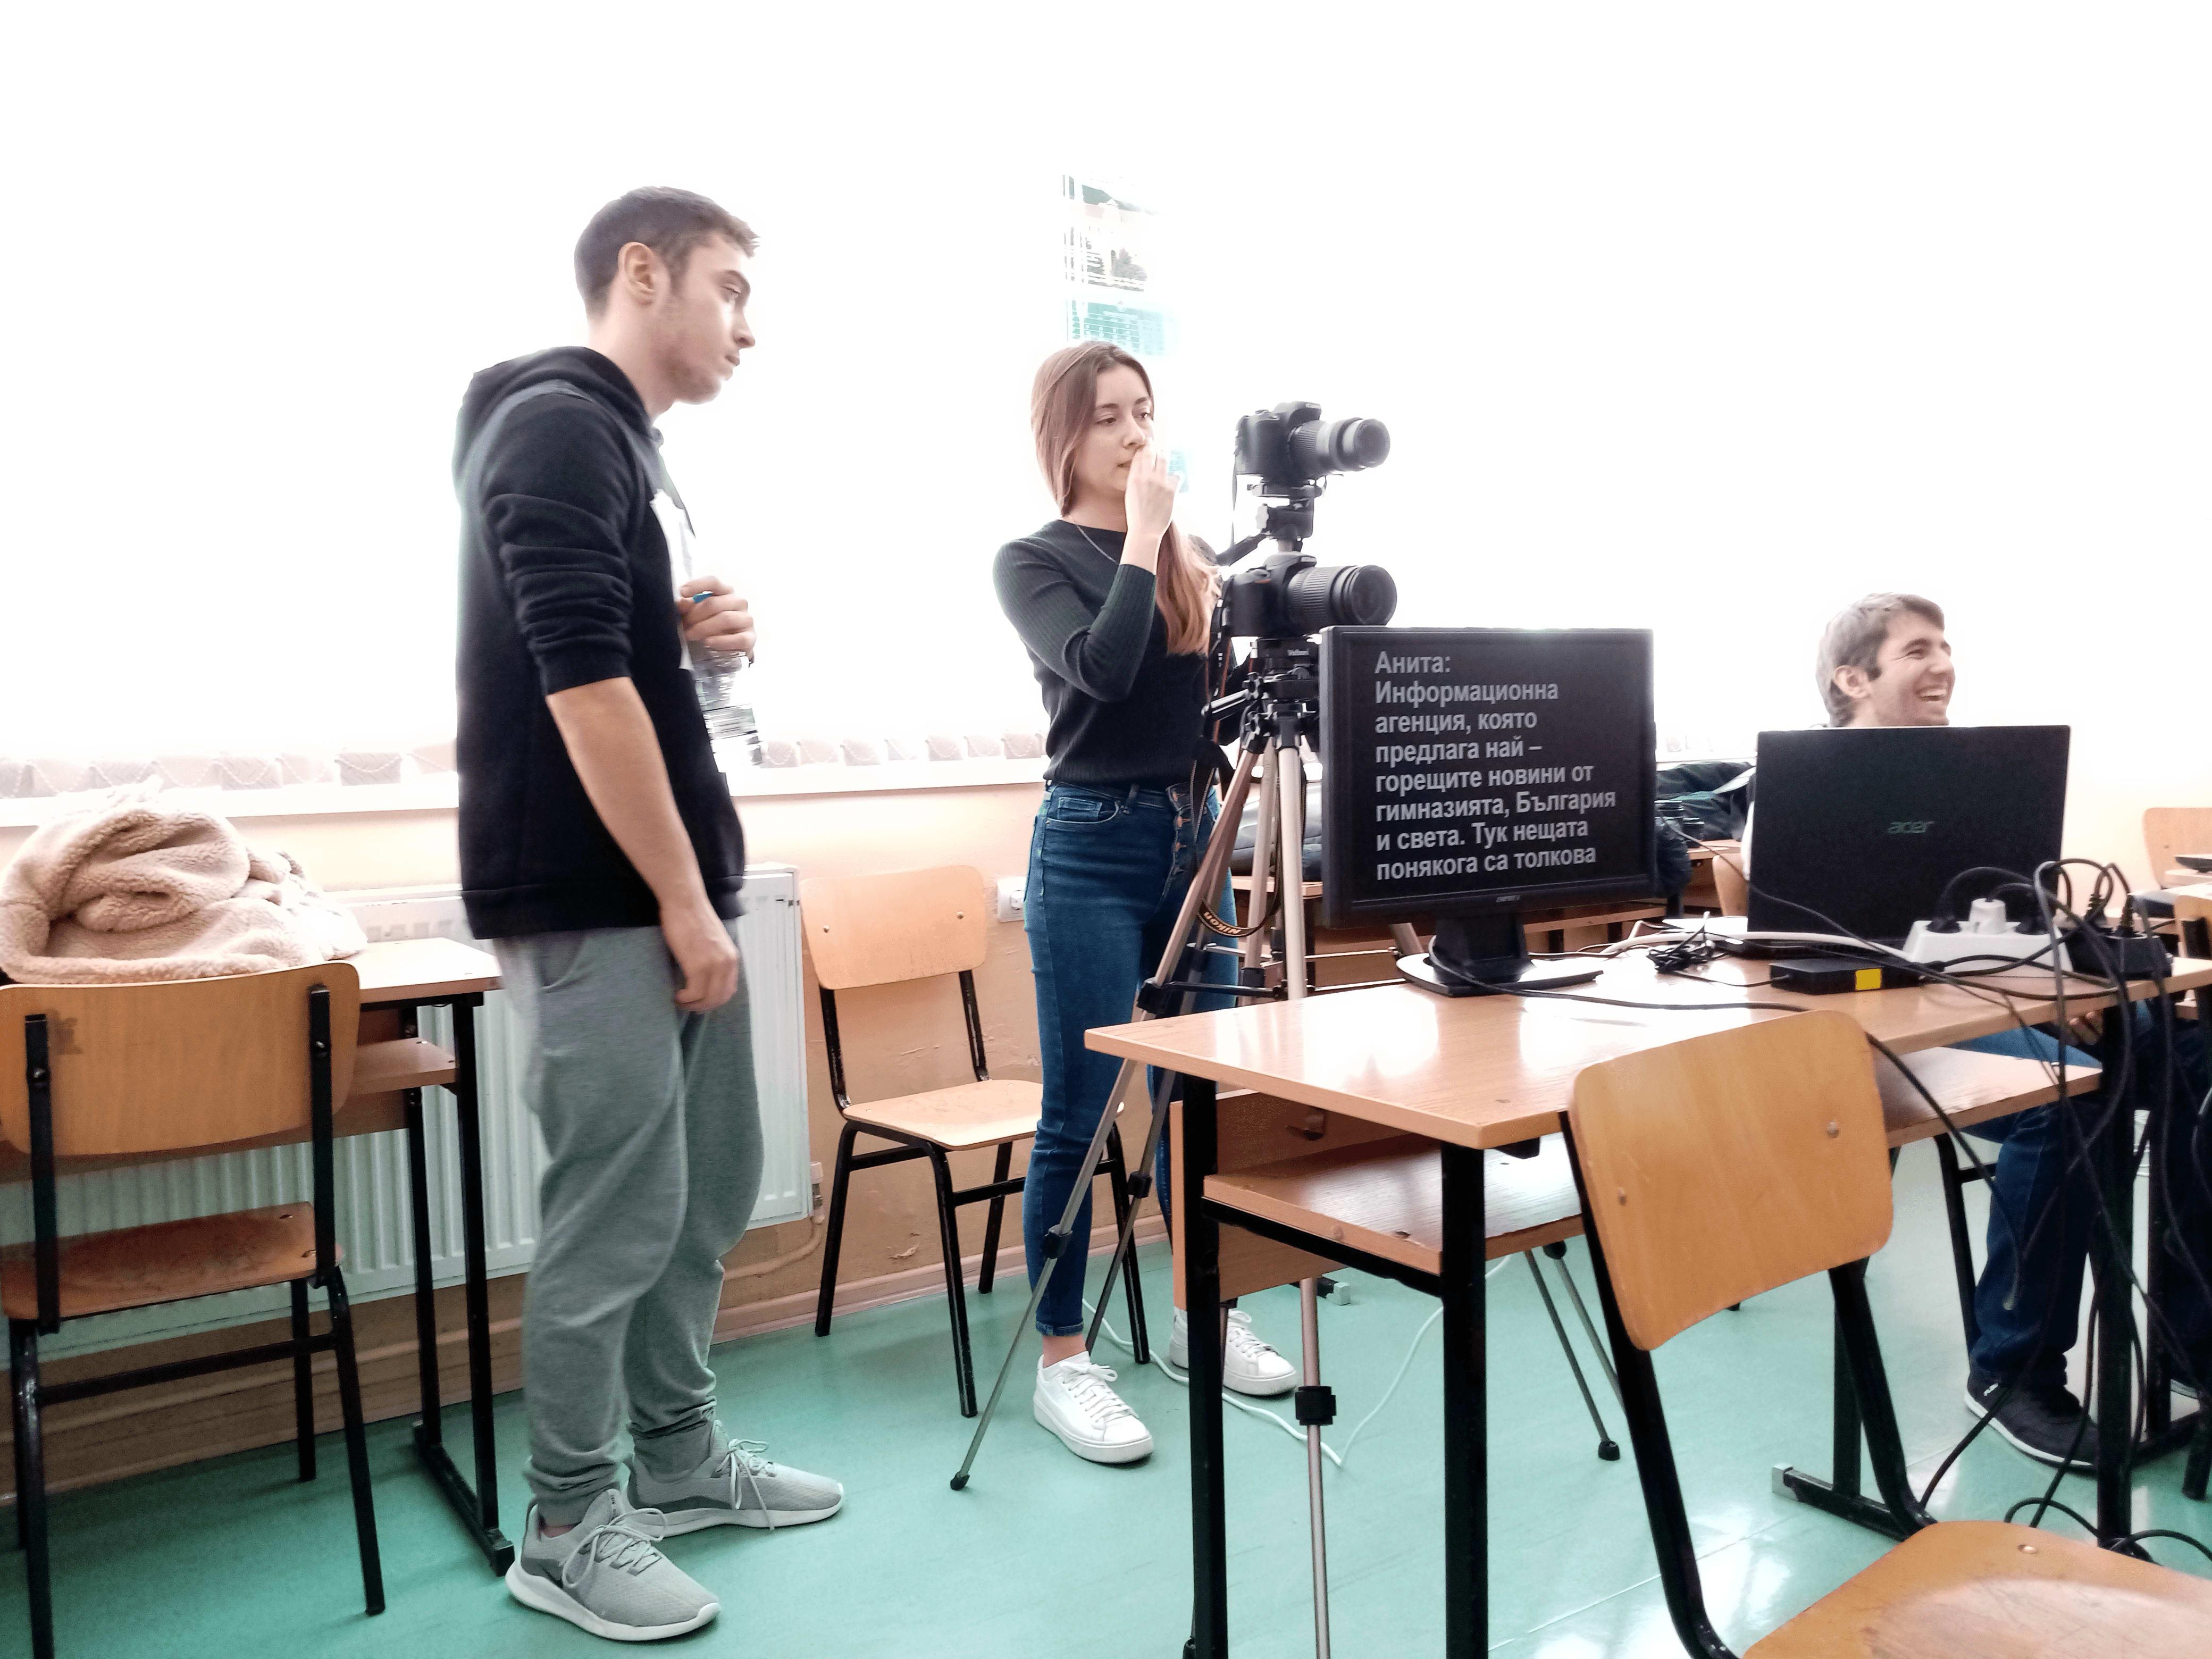 Slide 8 - ППМГ ТВ Сливен - Един ден на снимачната площадка